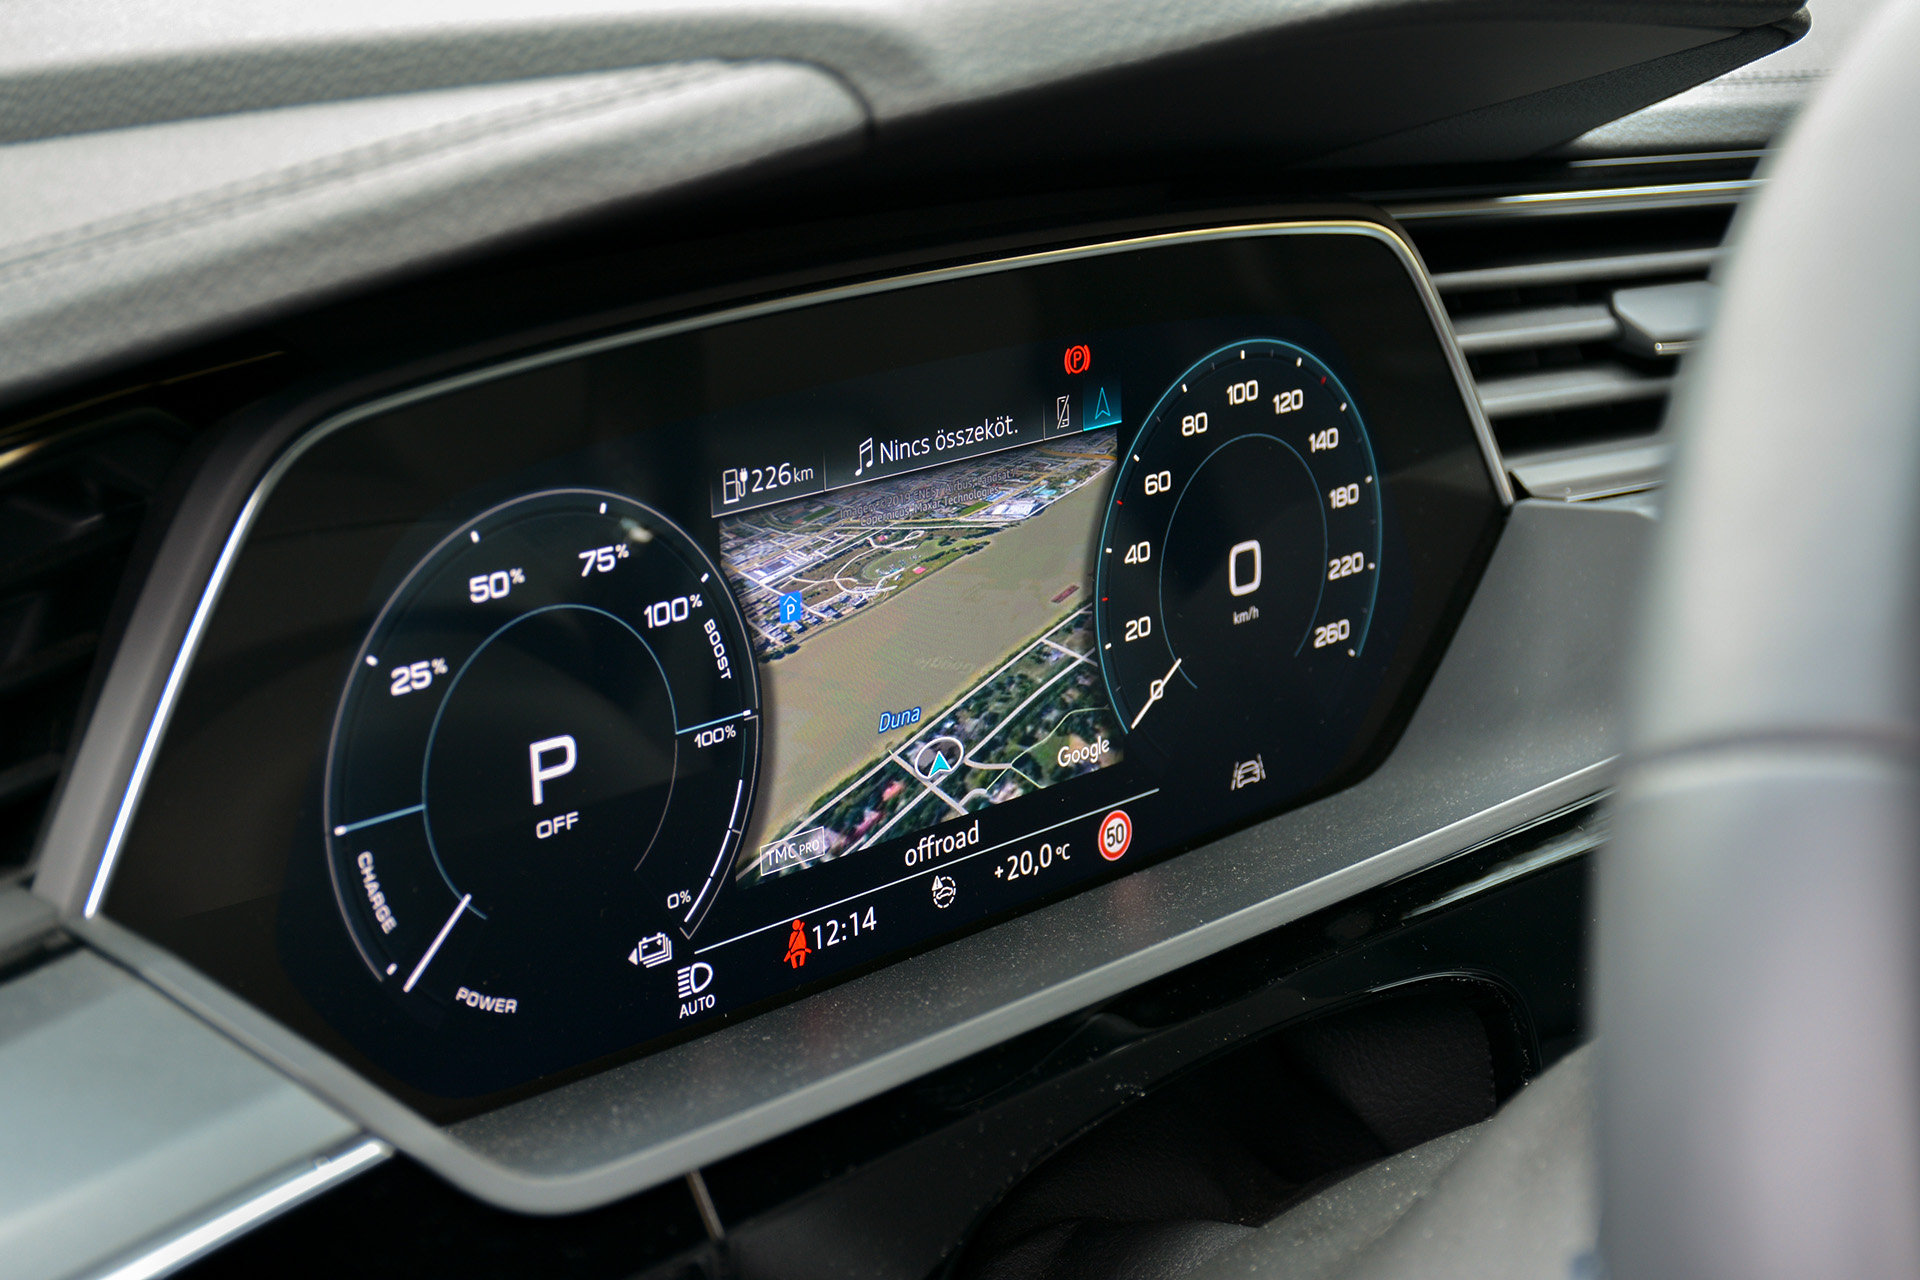 Audi e-tron Advenced 55 quattro